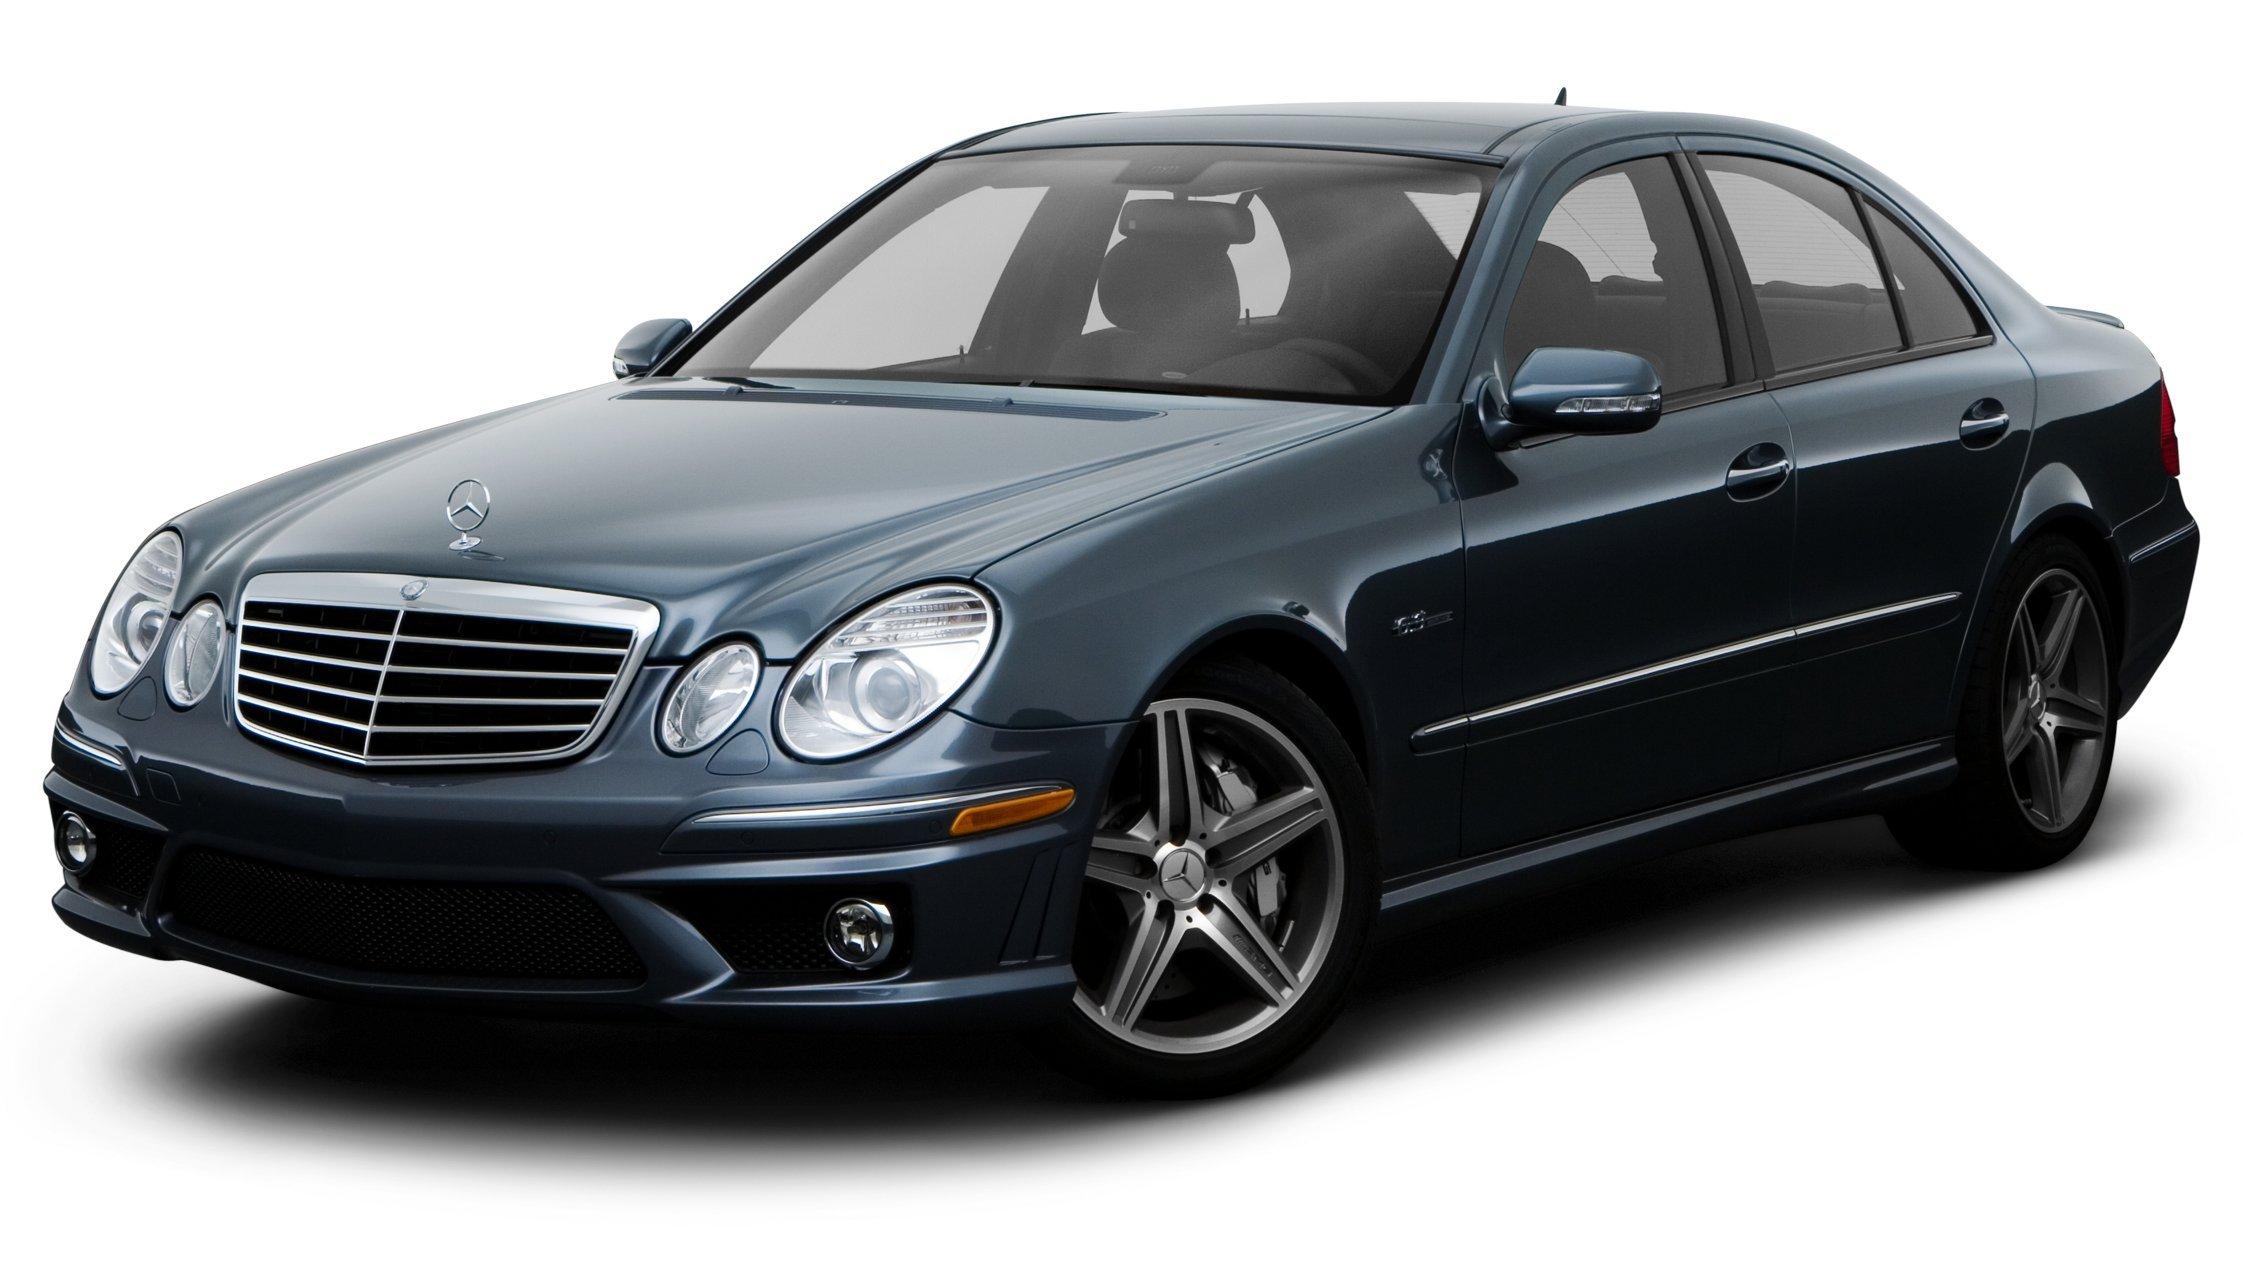 Amazon Com 2008 Mercedes Benz E320 3 0l Reviews Images And Specs Vehicles